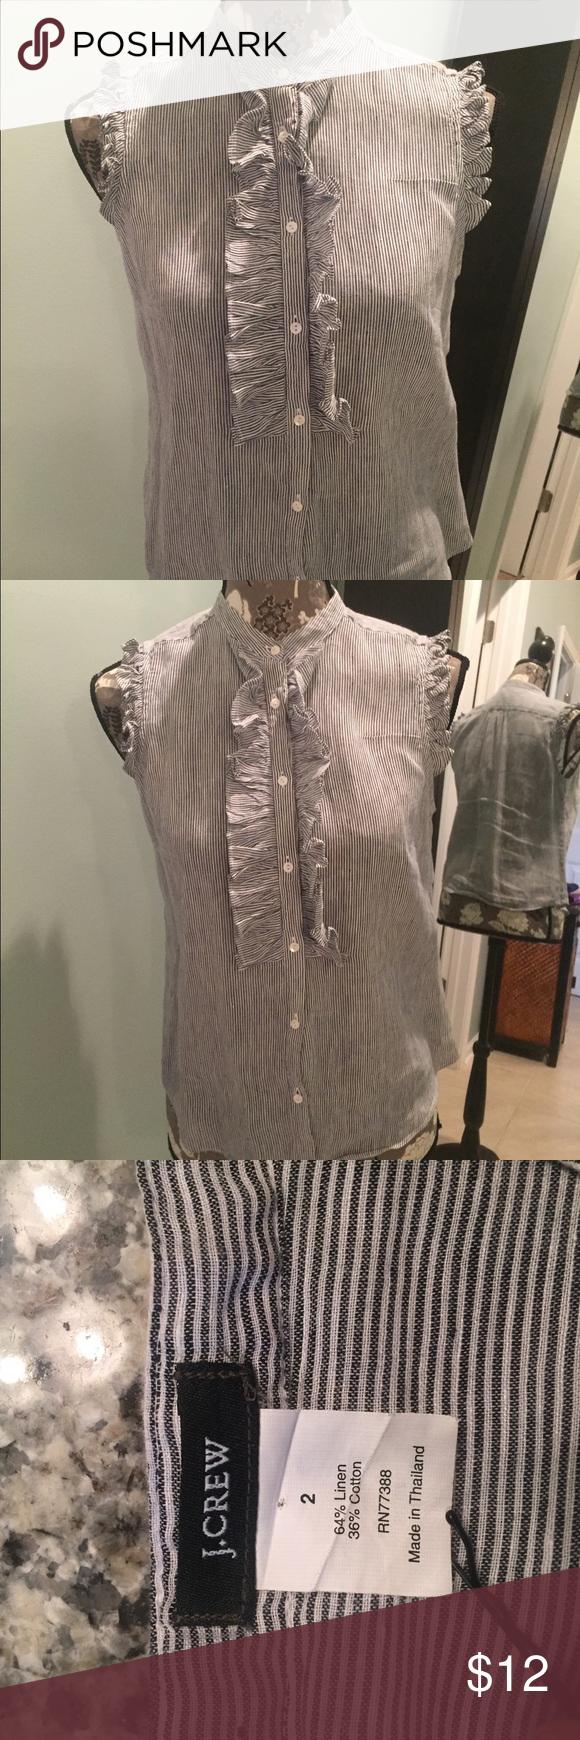 J. CREW Button up blouse Striped J. CREW blouse J. Crew Tops Blouses